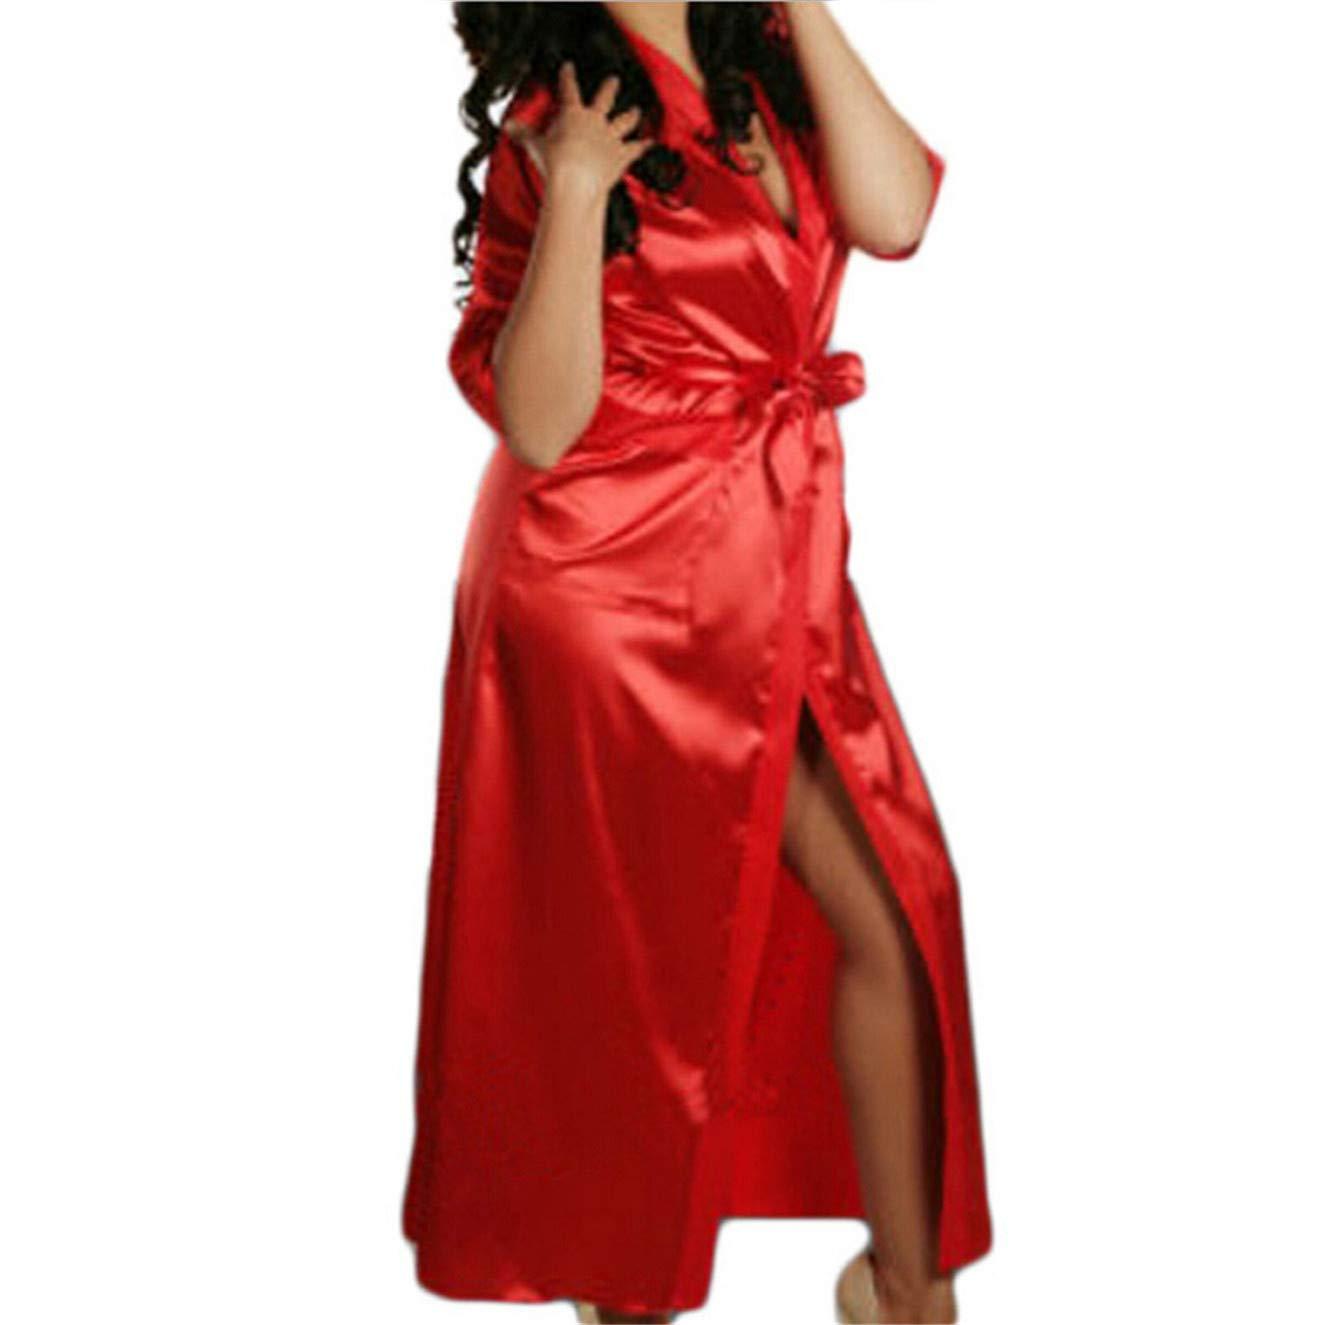 TIFENNY Women's Sexy Satin Ice Silk Bath Robe Babydoll Lingerie Nightdress Underwear Bathrobe Long Dress Red